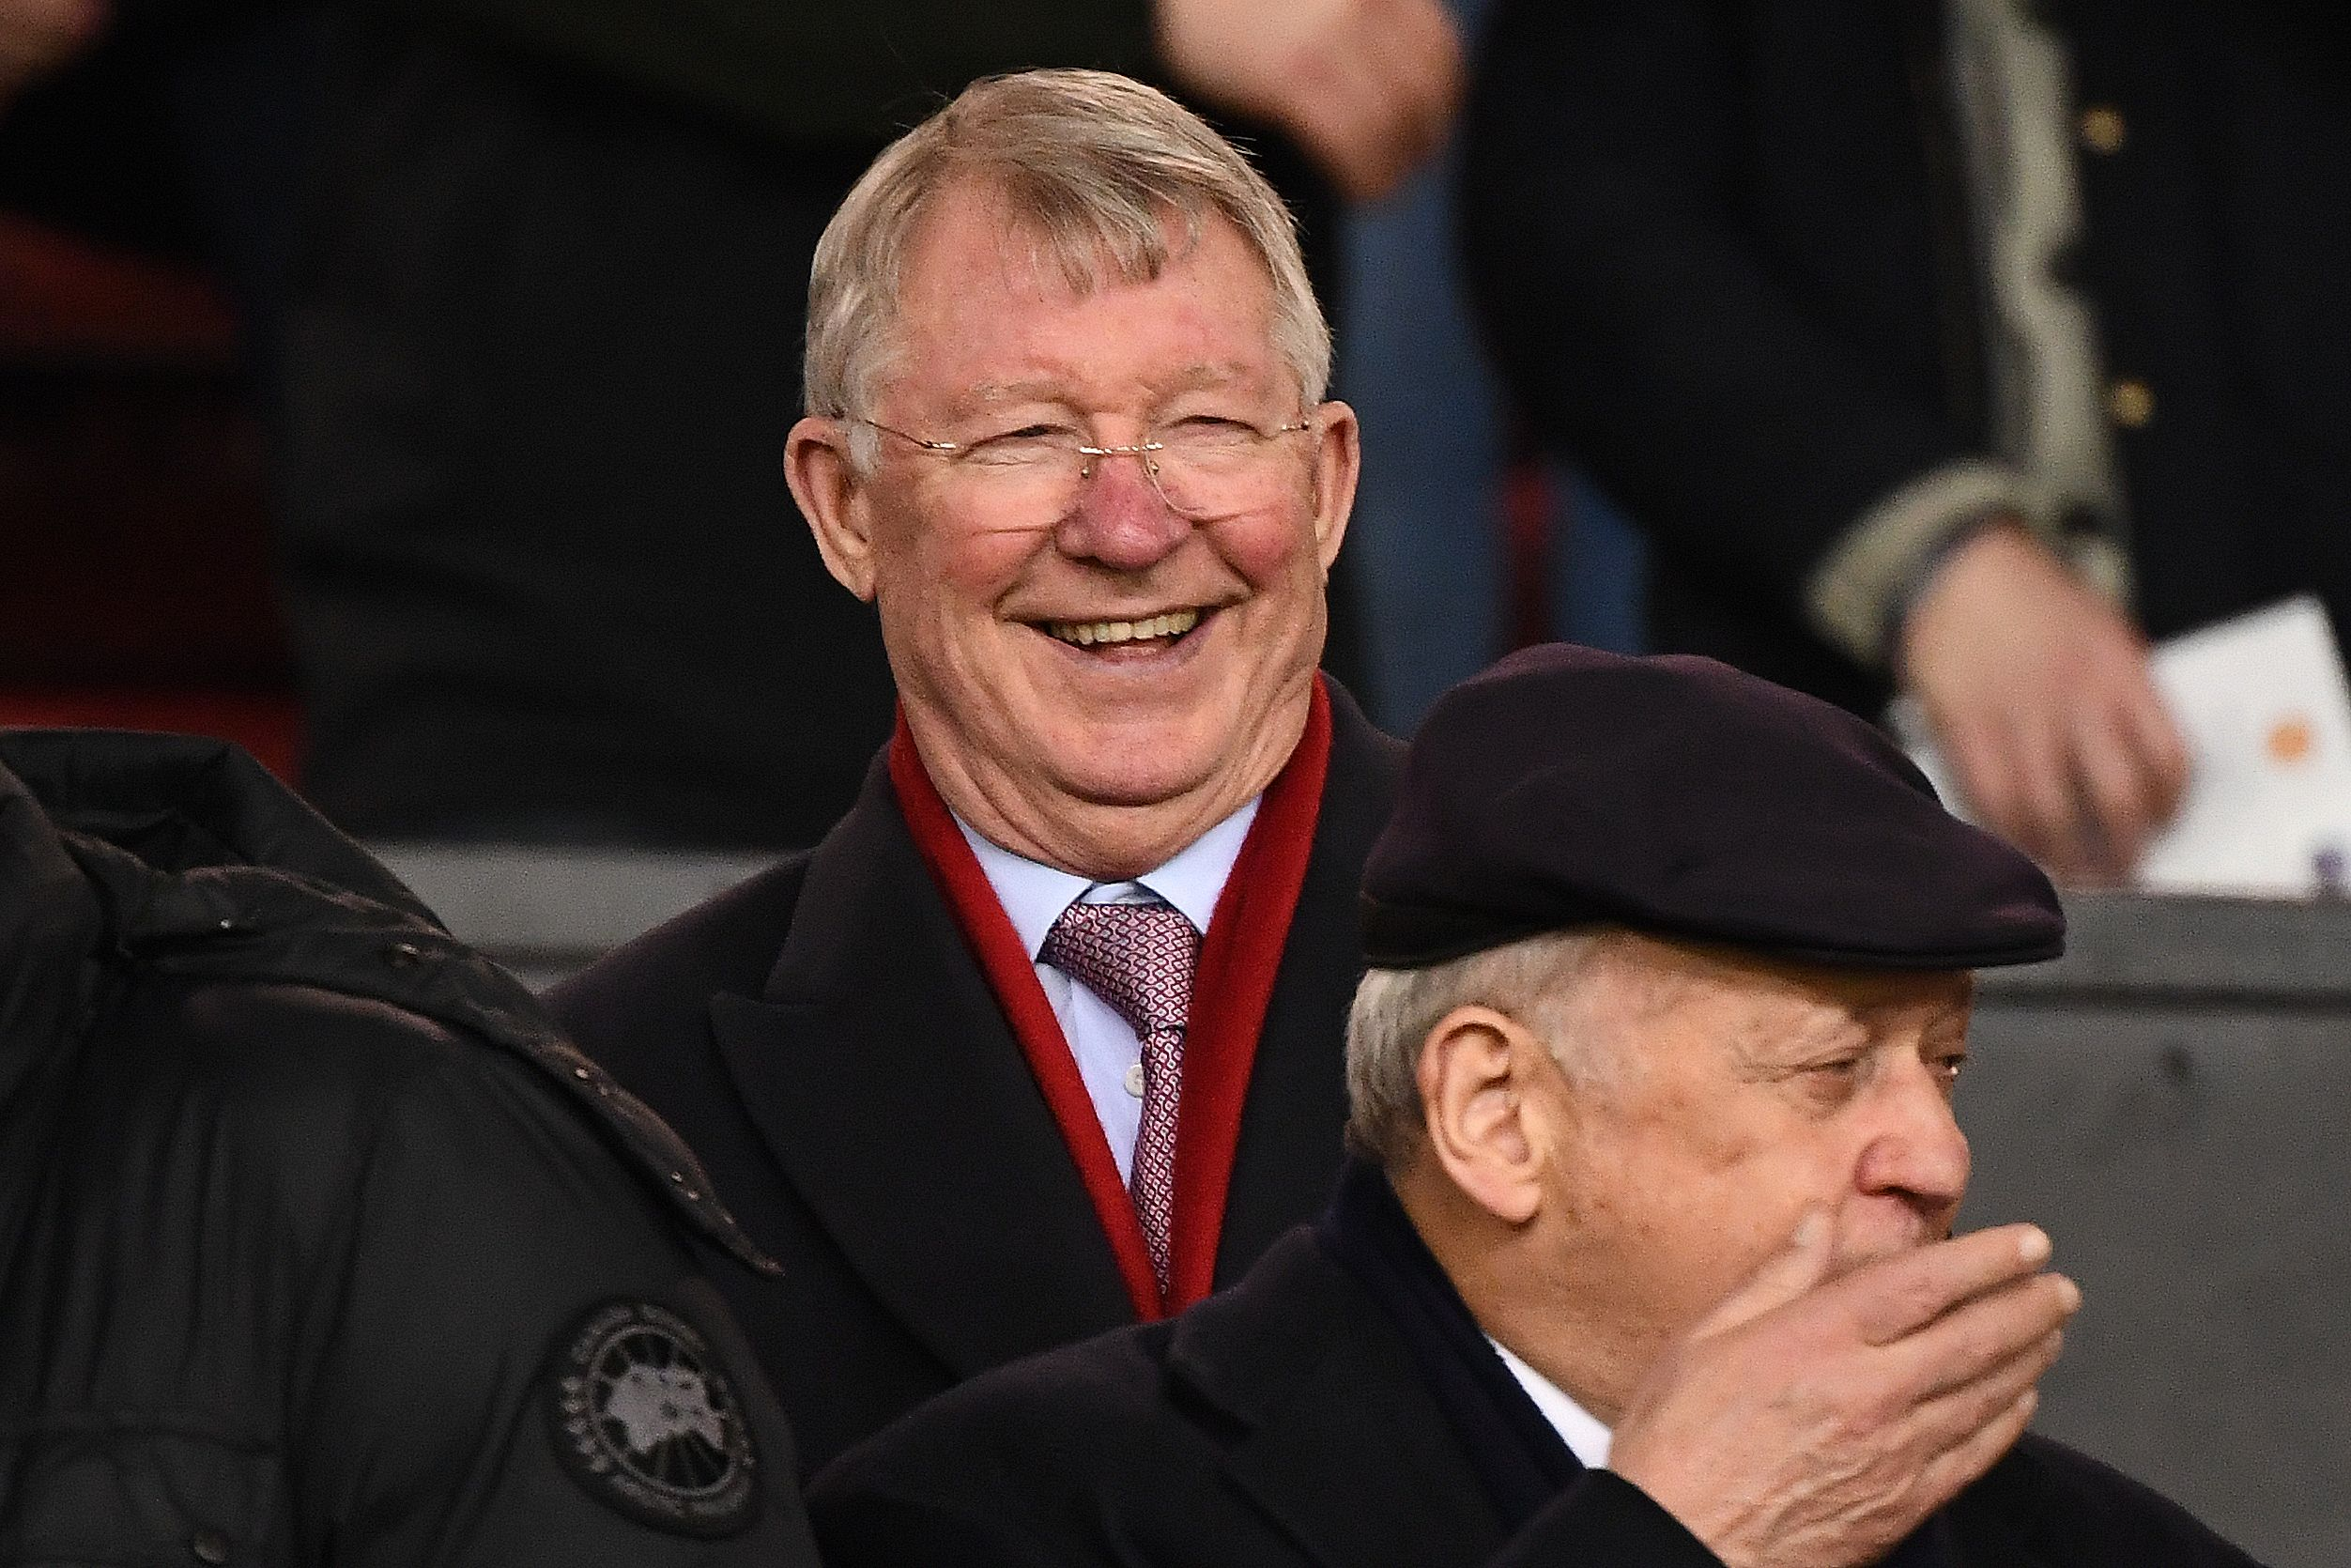 Ole Gunnar Solskjaer has worked closely with Sir Alex Ferguson at United